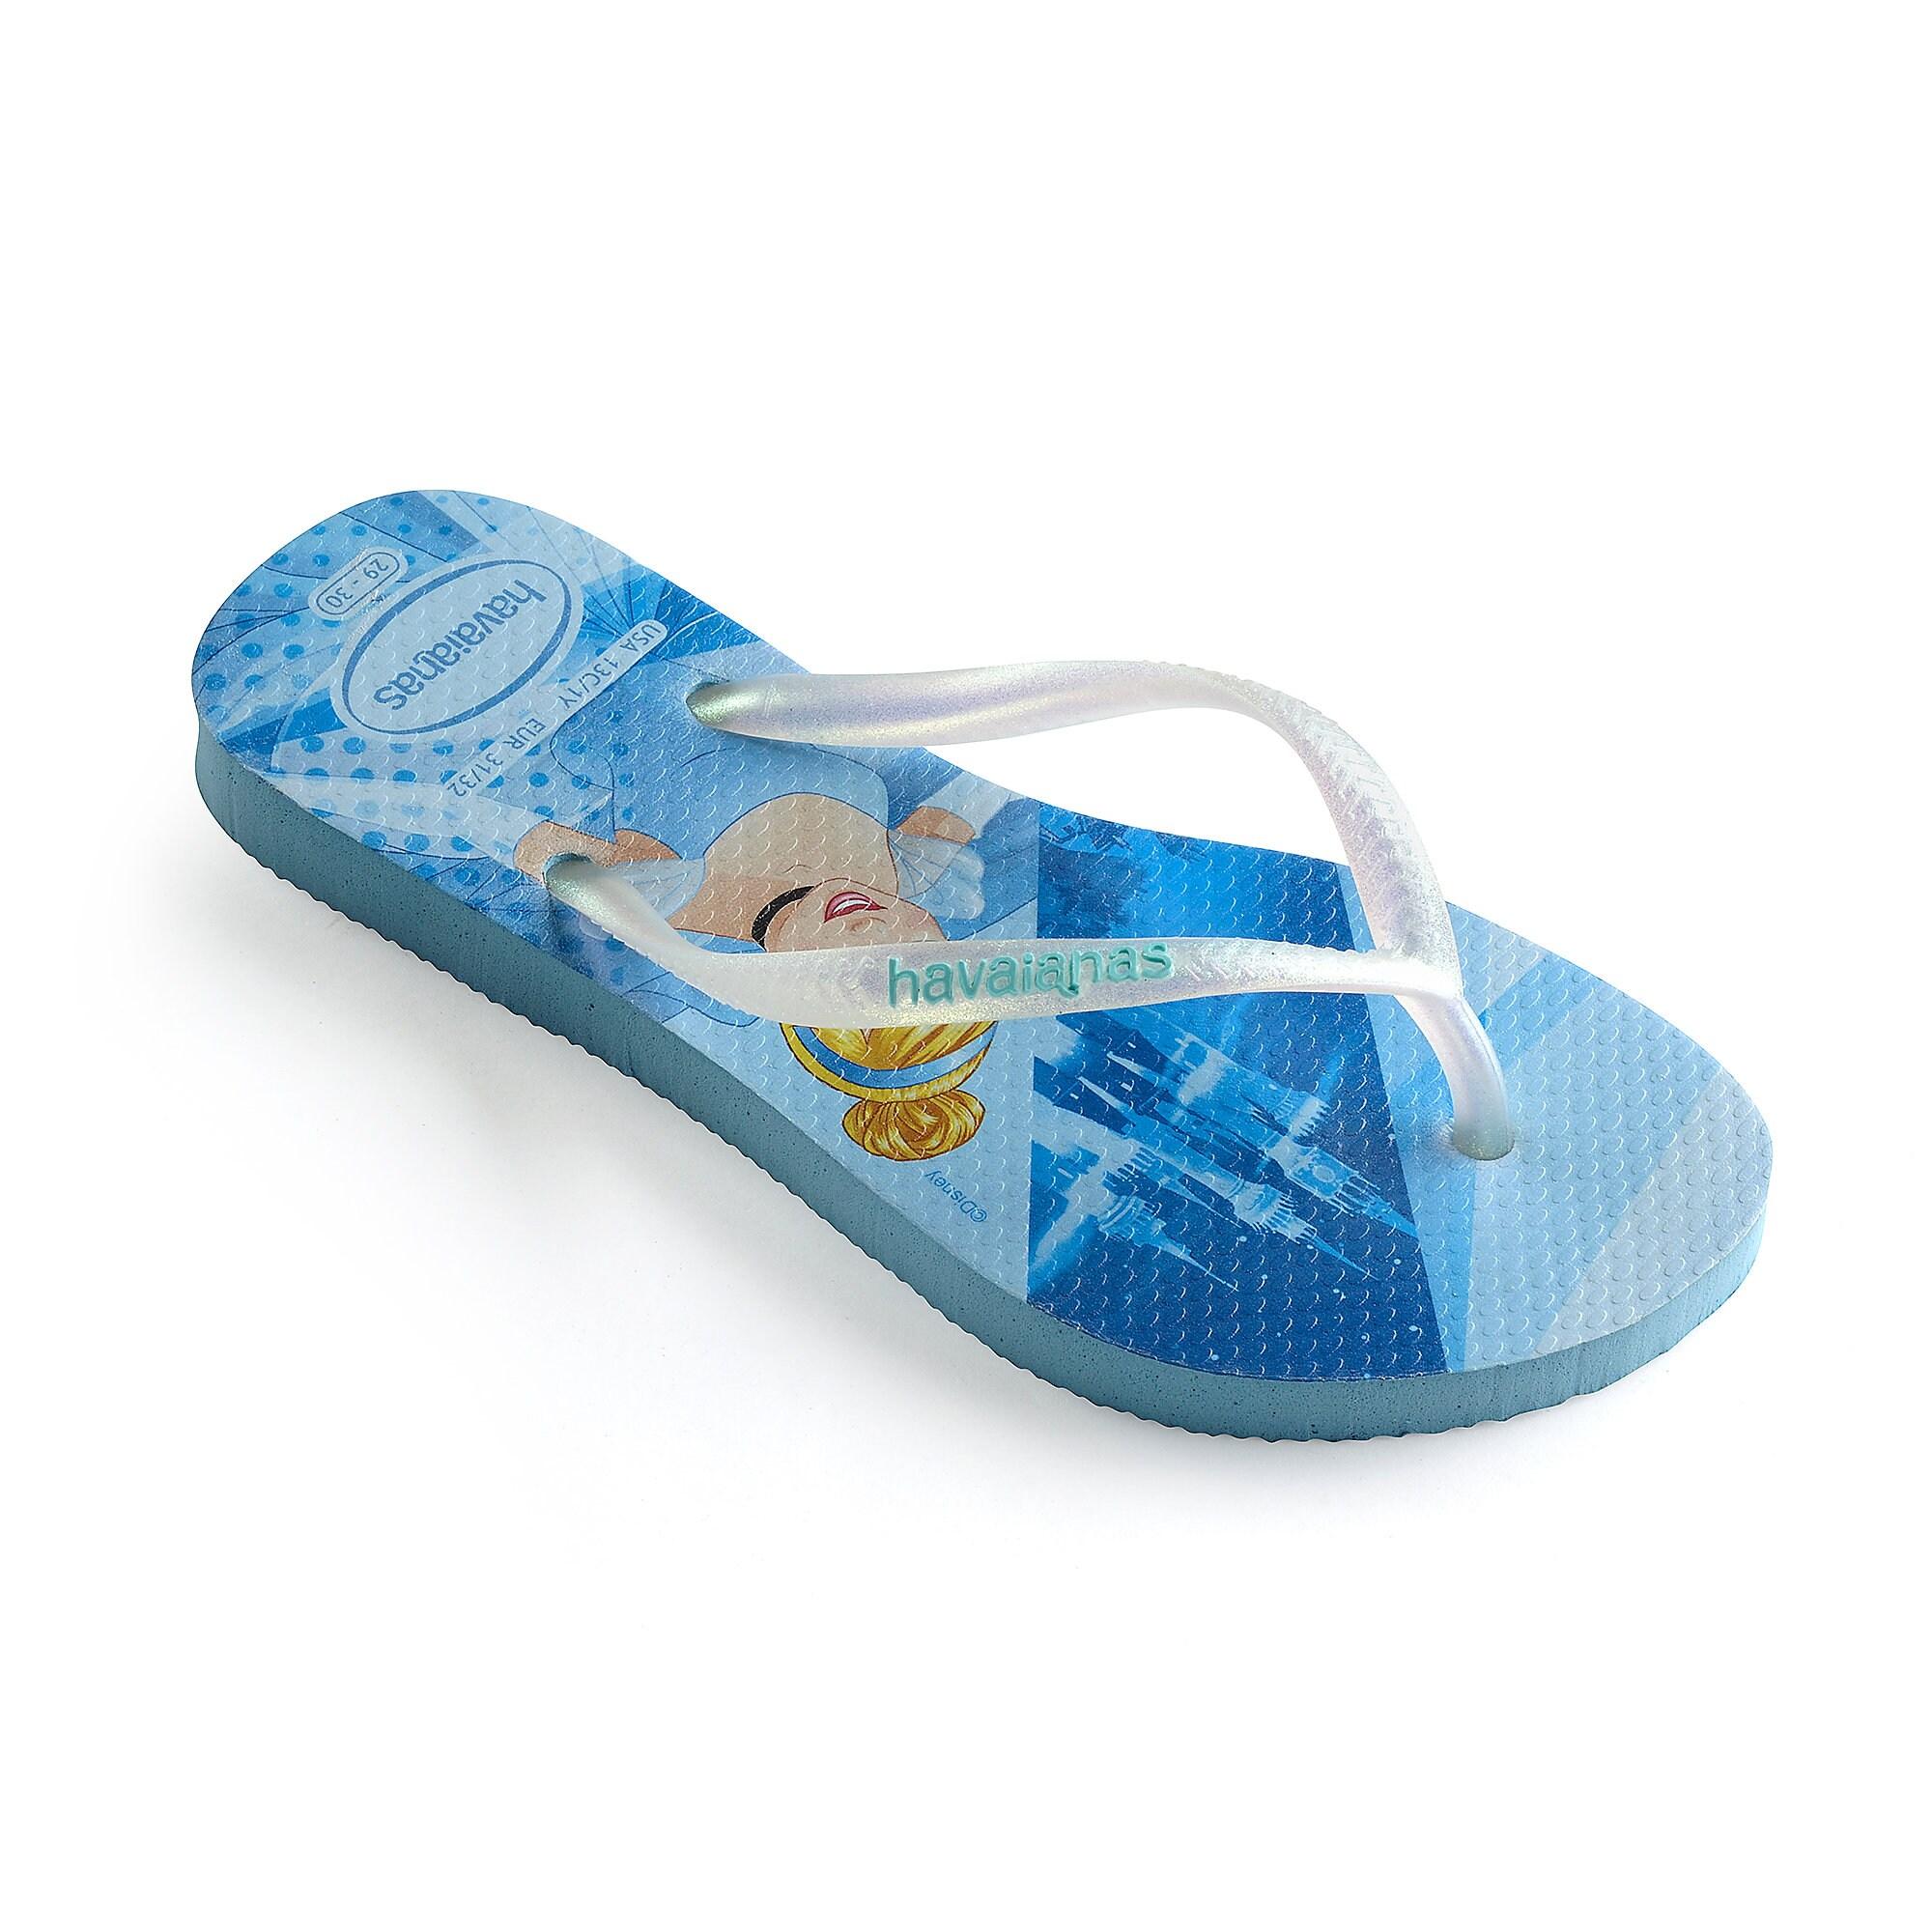 5b66b67c623e9d Cinderella Flip Flops for Kids by Havaianas